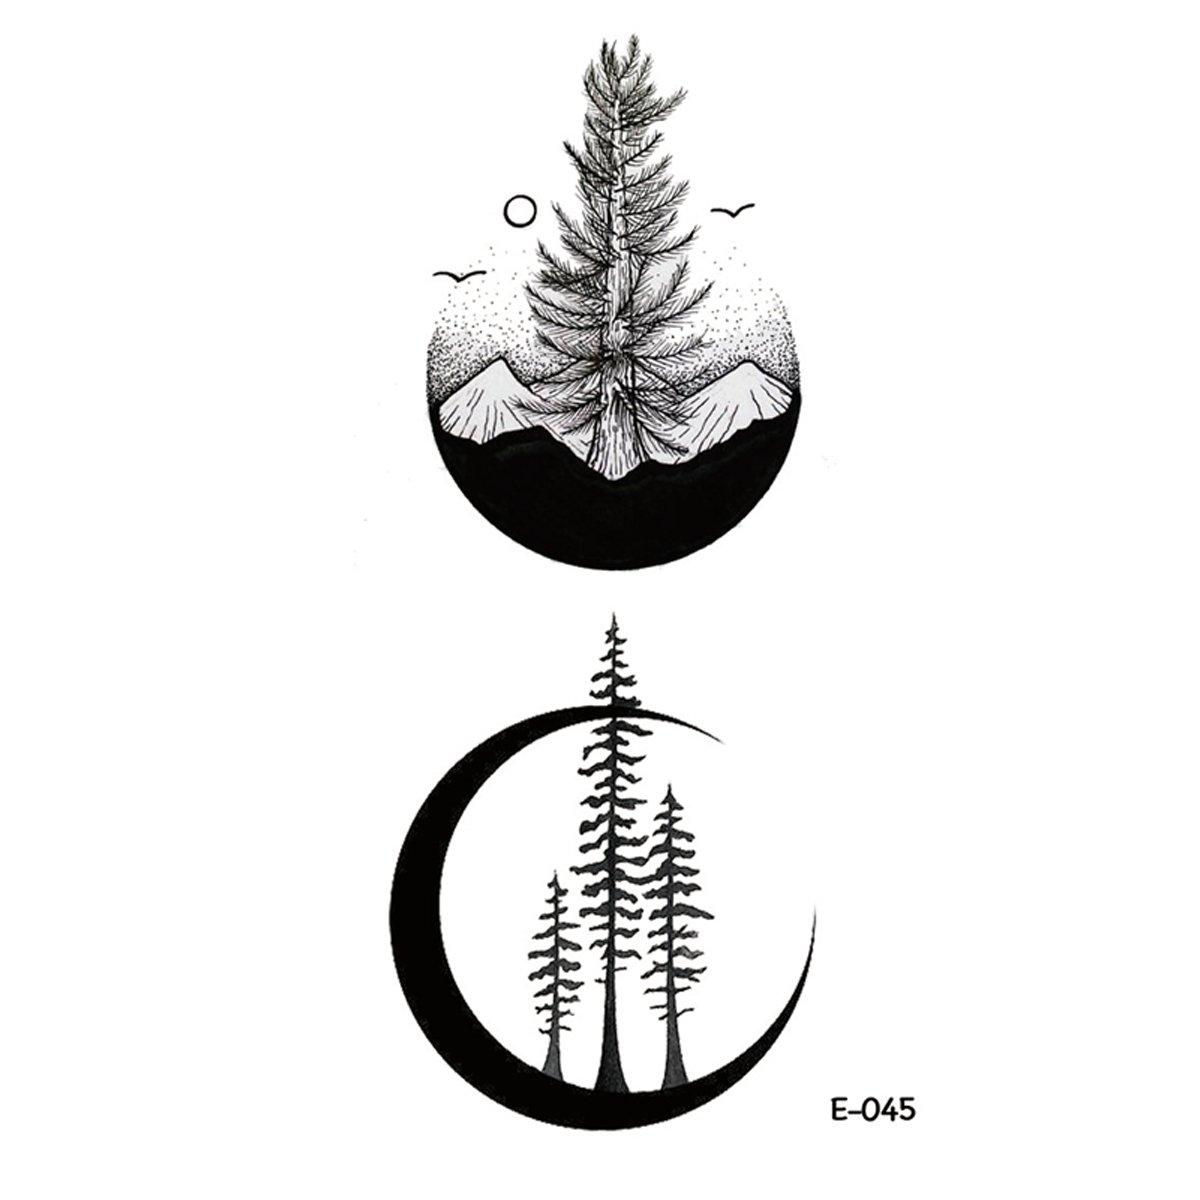 WYUEN 5 Sheets New Design Moon Temporary Tattoo Tree Tattoo Sticker for Women Men Body Art 9.8X6cm FE-045